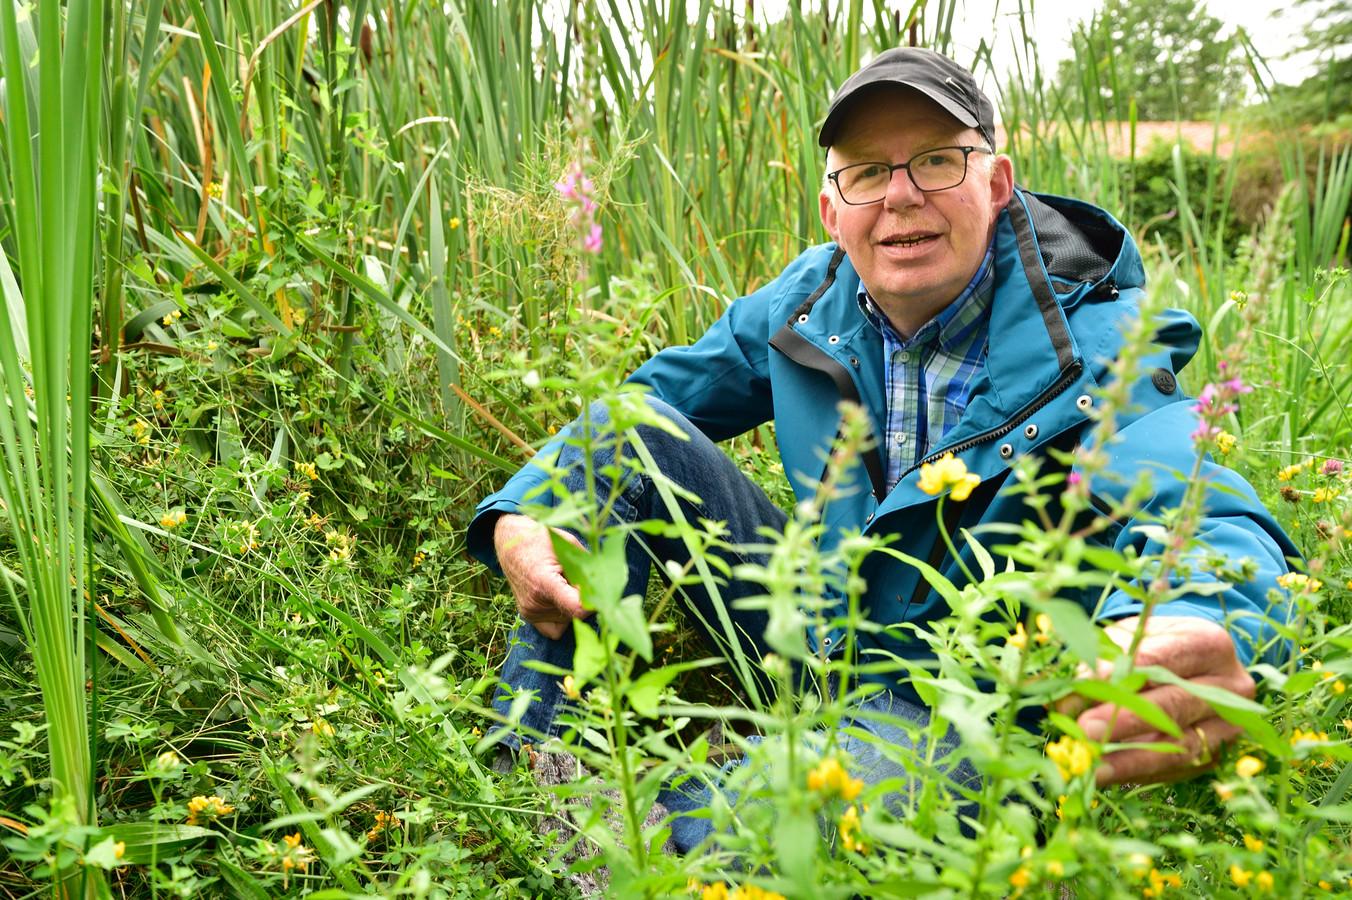 Stadsecoloog André van Kleinwee (61) uit Woerden is uitgeroepen tot 'bovenstebeste bermbeheerder' van 2020.